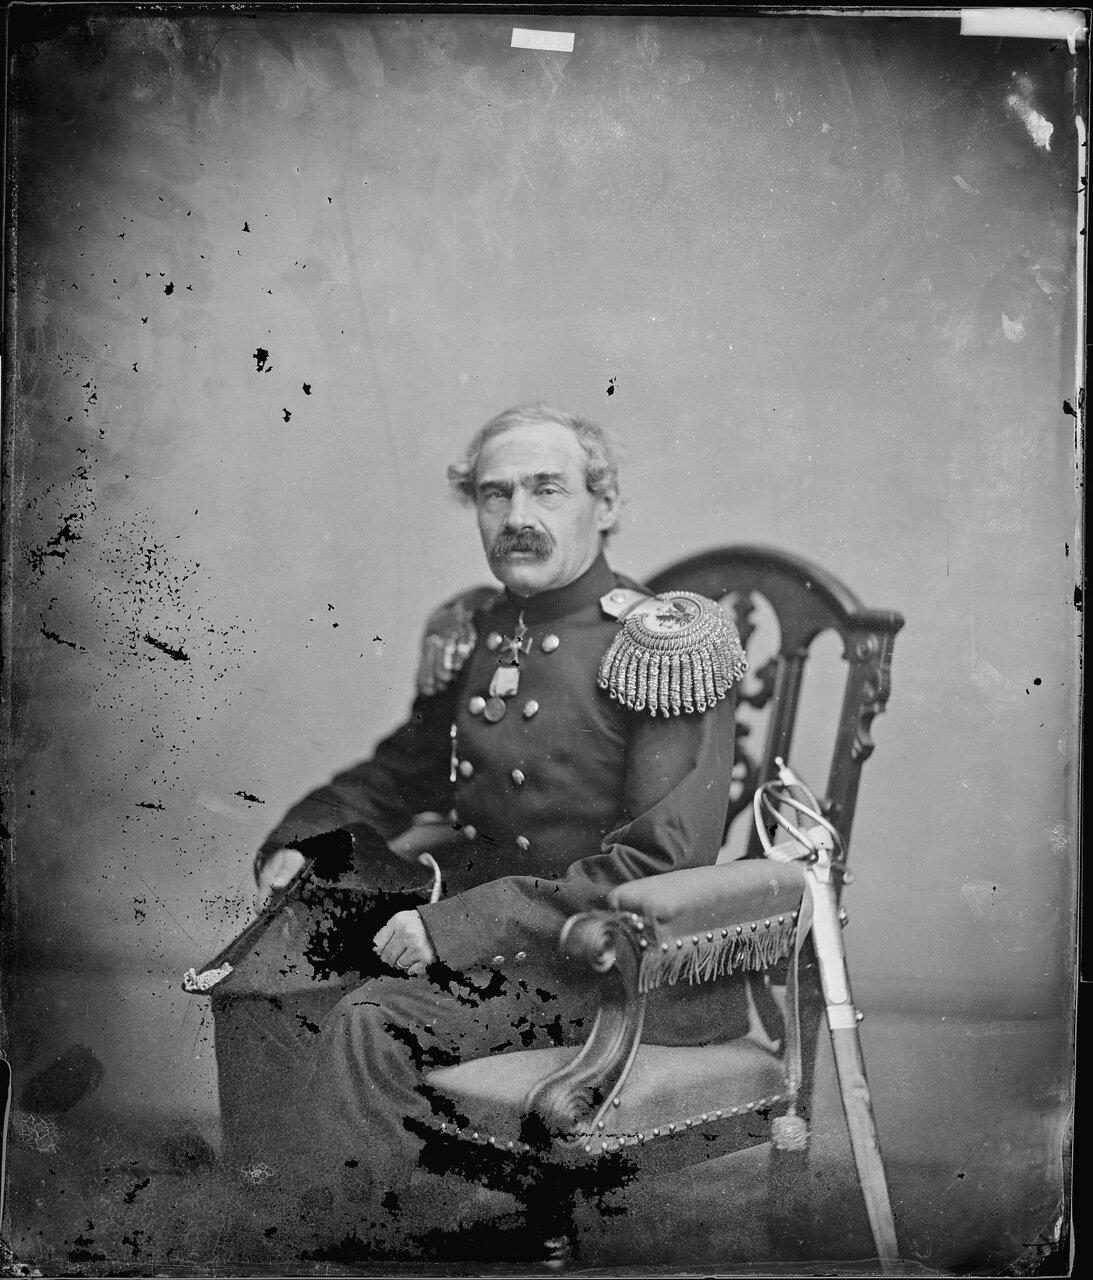 Адмирал Степан Степанович Лесовский (1817-1884)